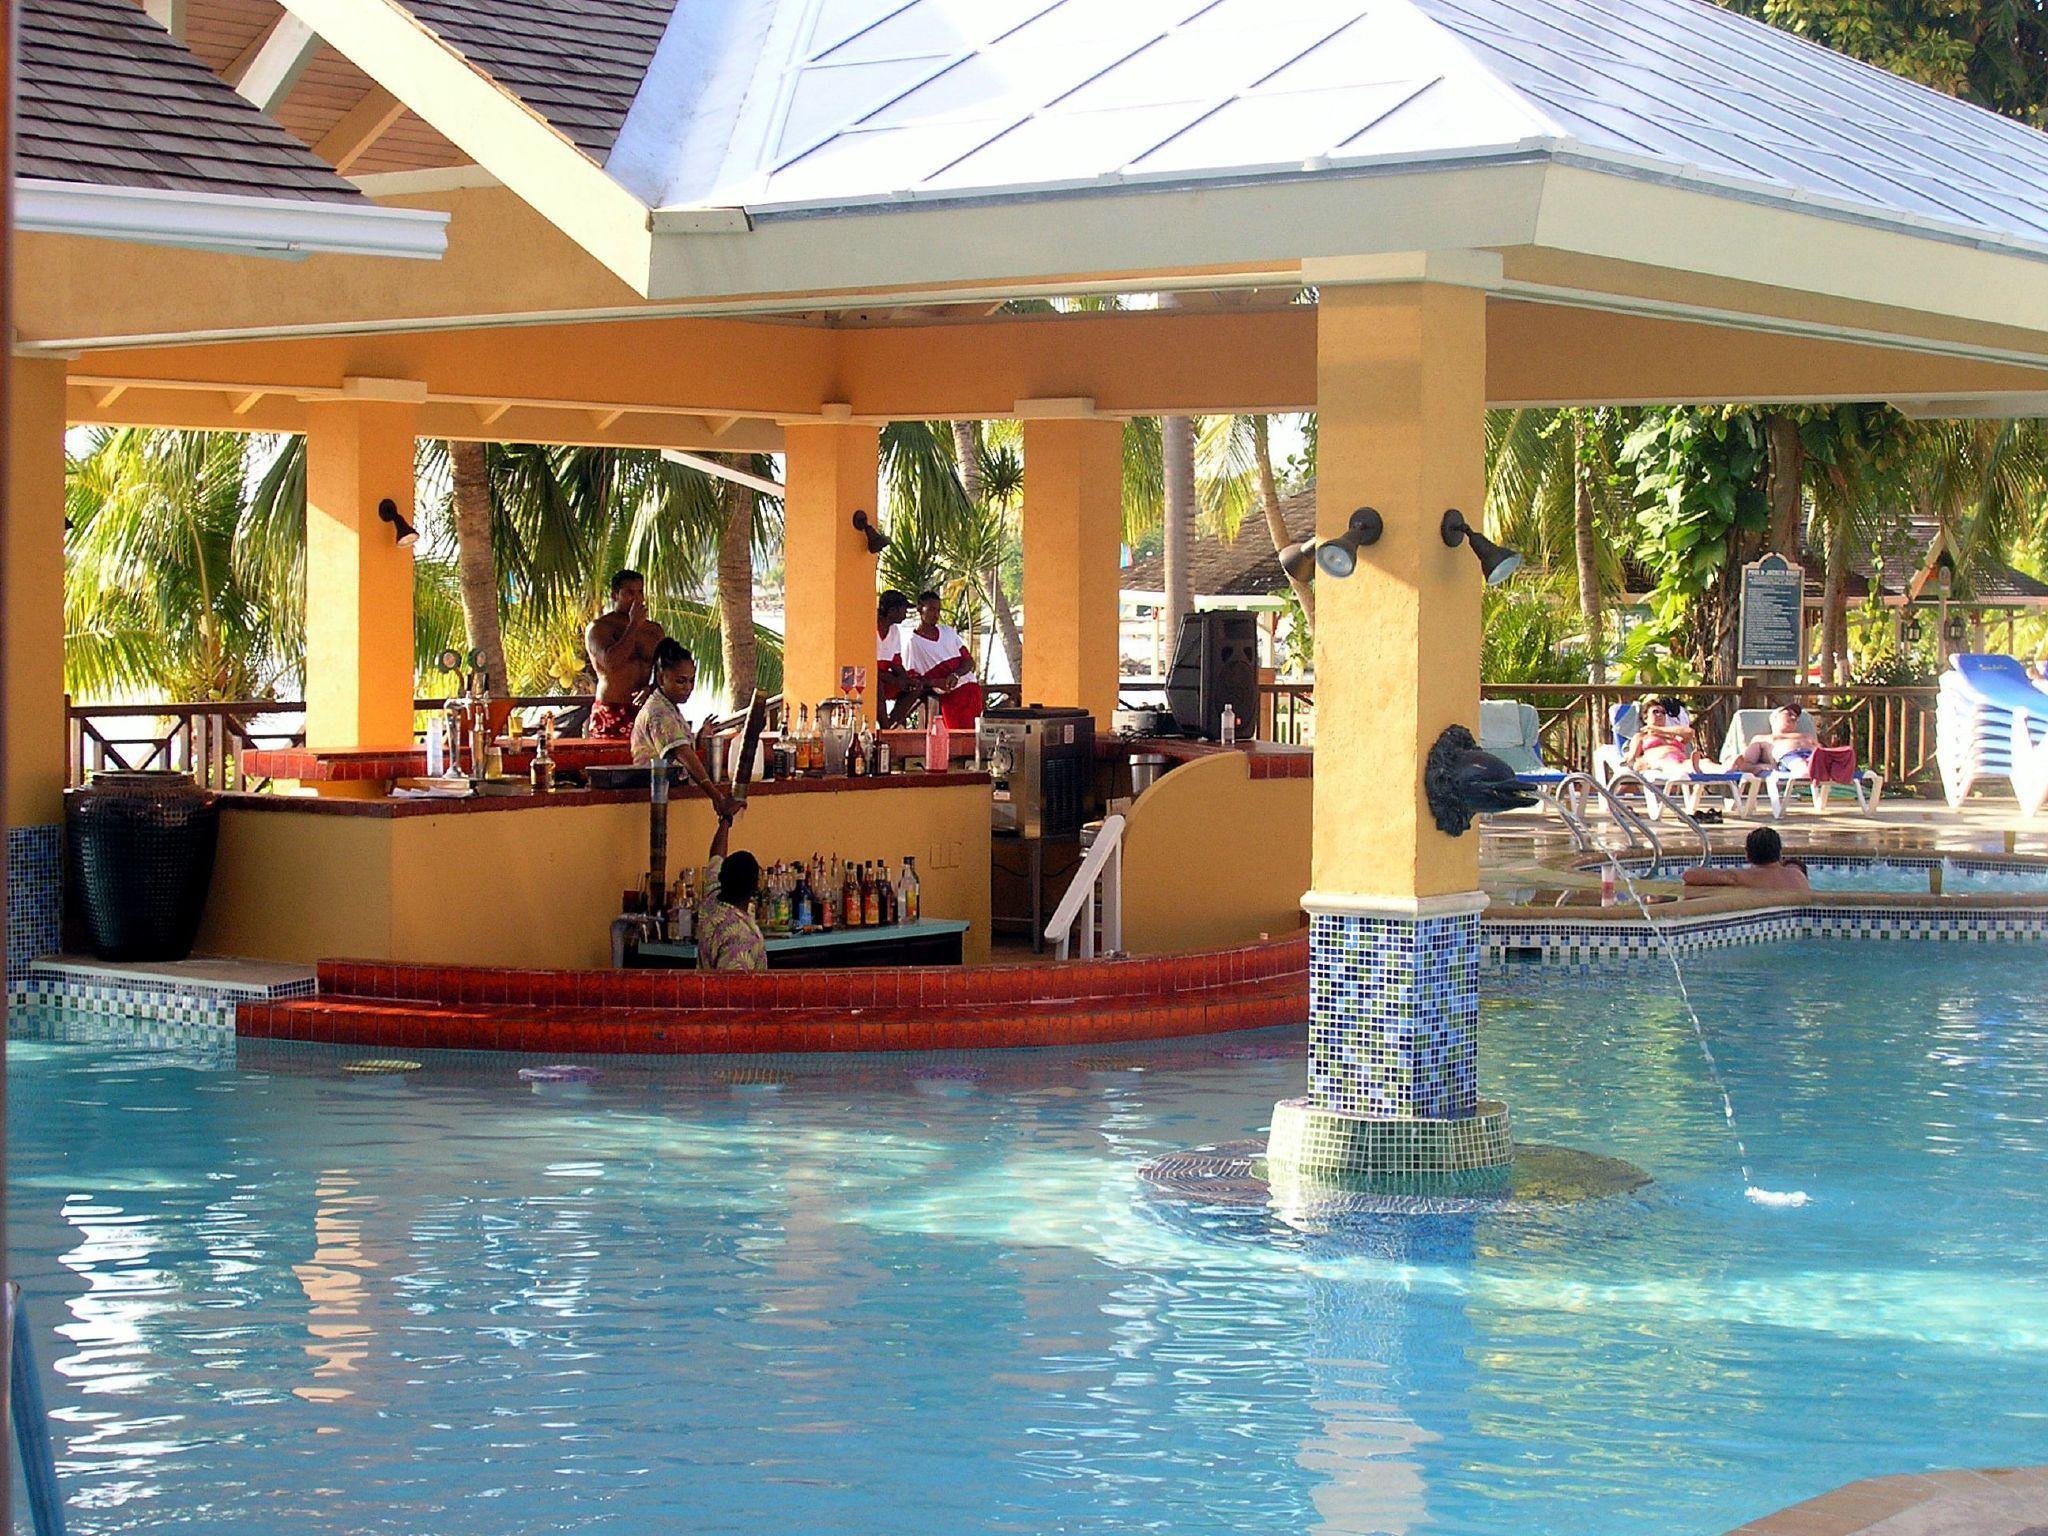 swim up bar at Sandals Negril Jamaica. Trip Advisor rating